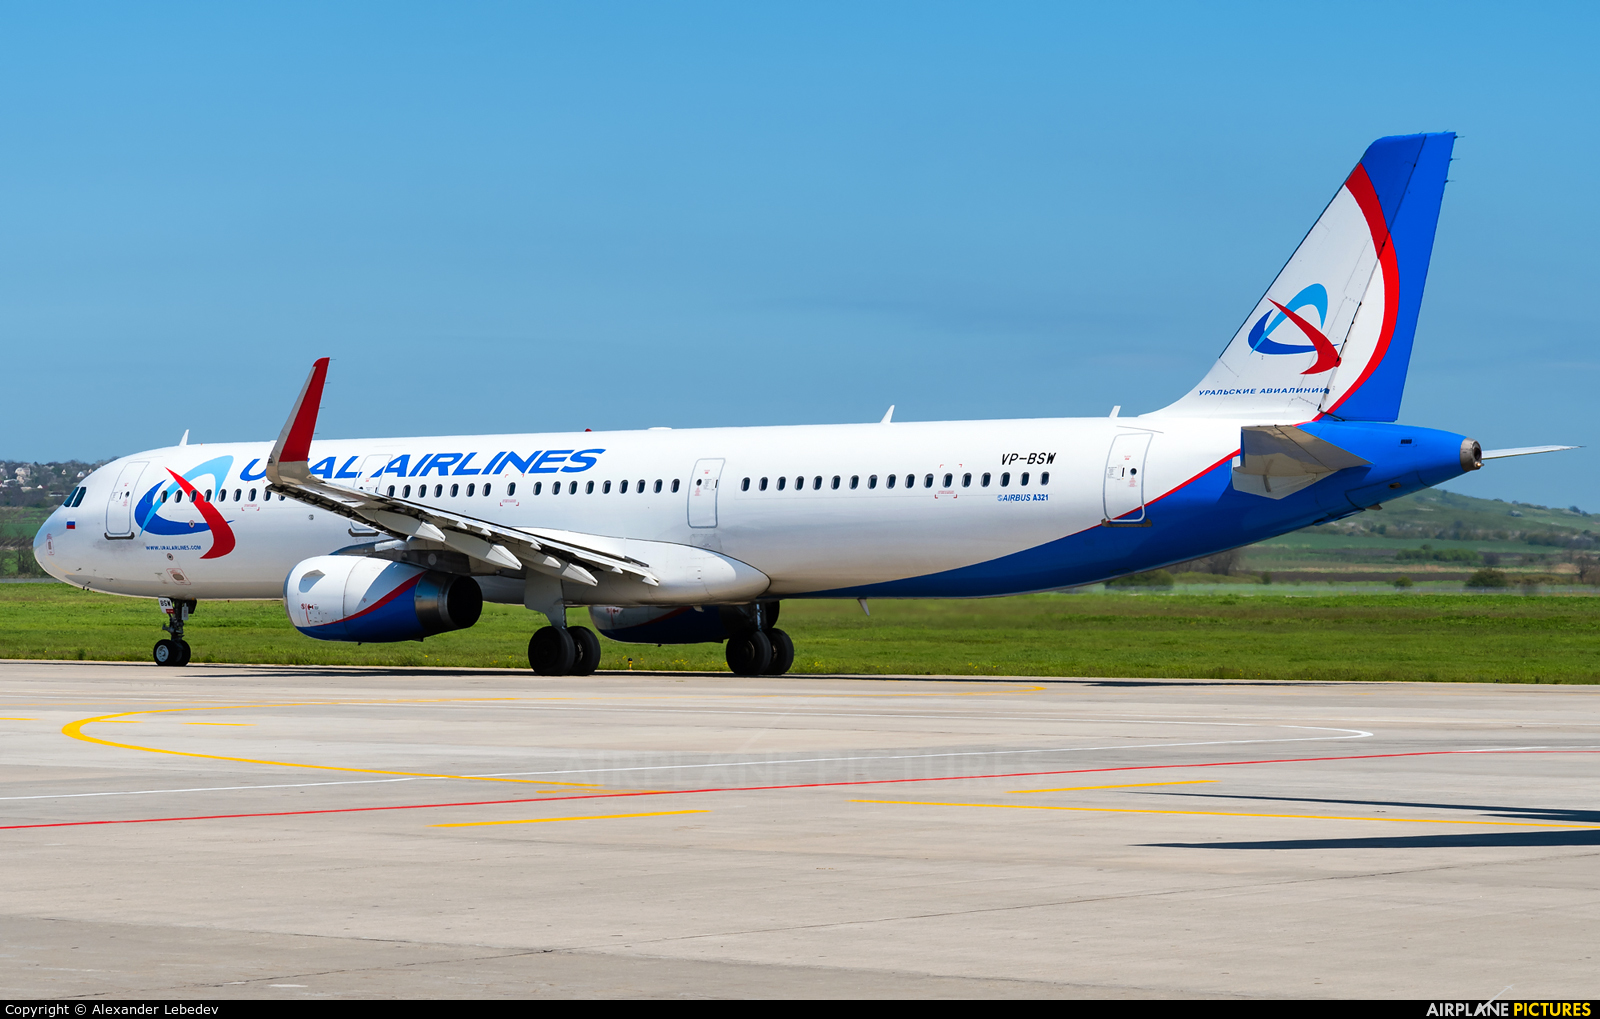 Ural Airlines VP-BSW aircraft at Anapa Airport